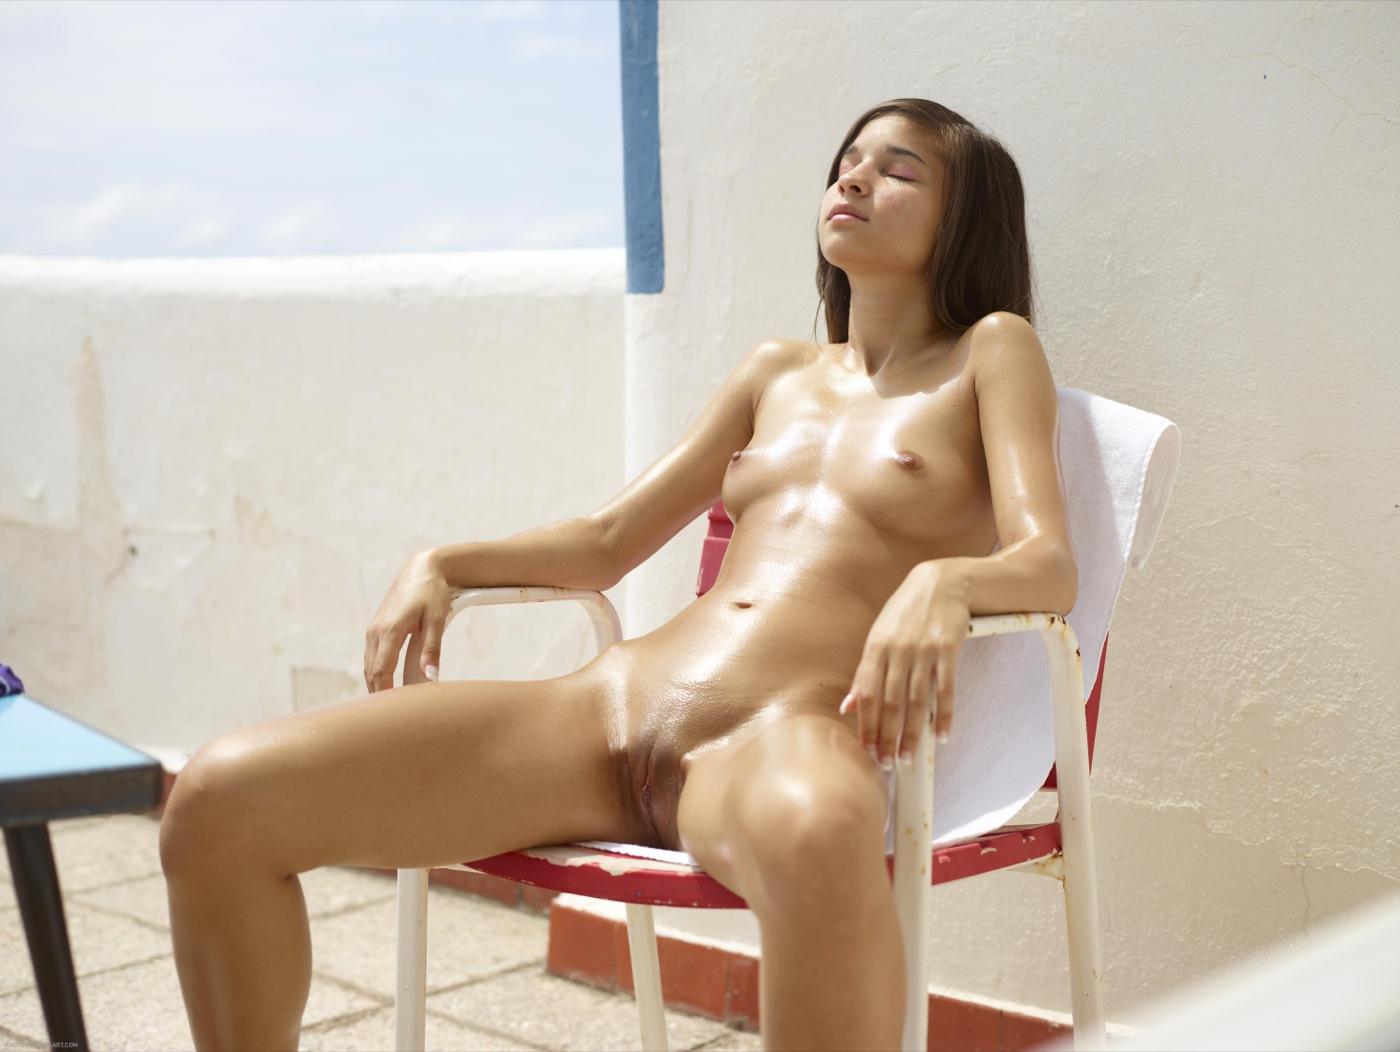 Summertime Nude Babe Teen Shaved Outdoor Erotic Hegre